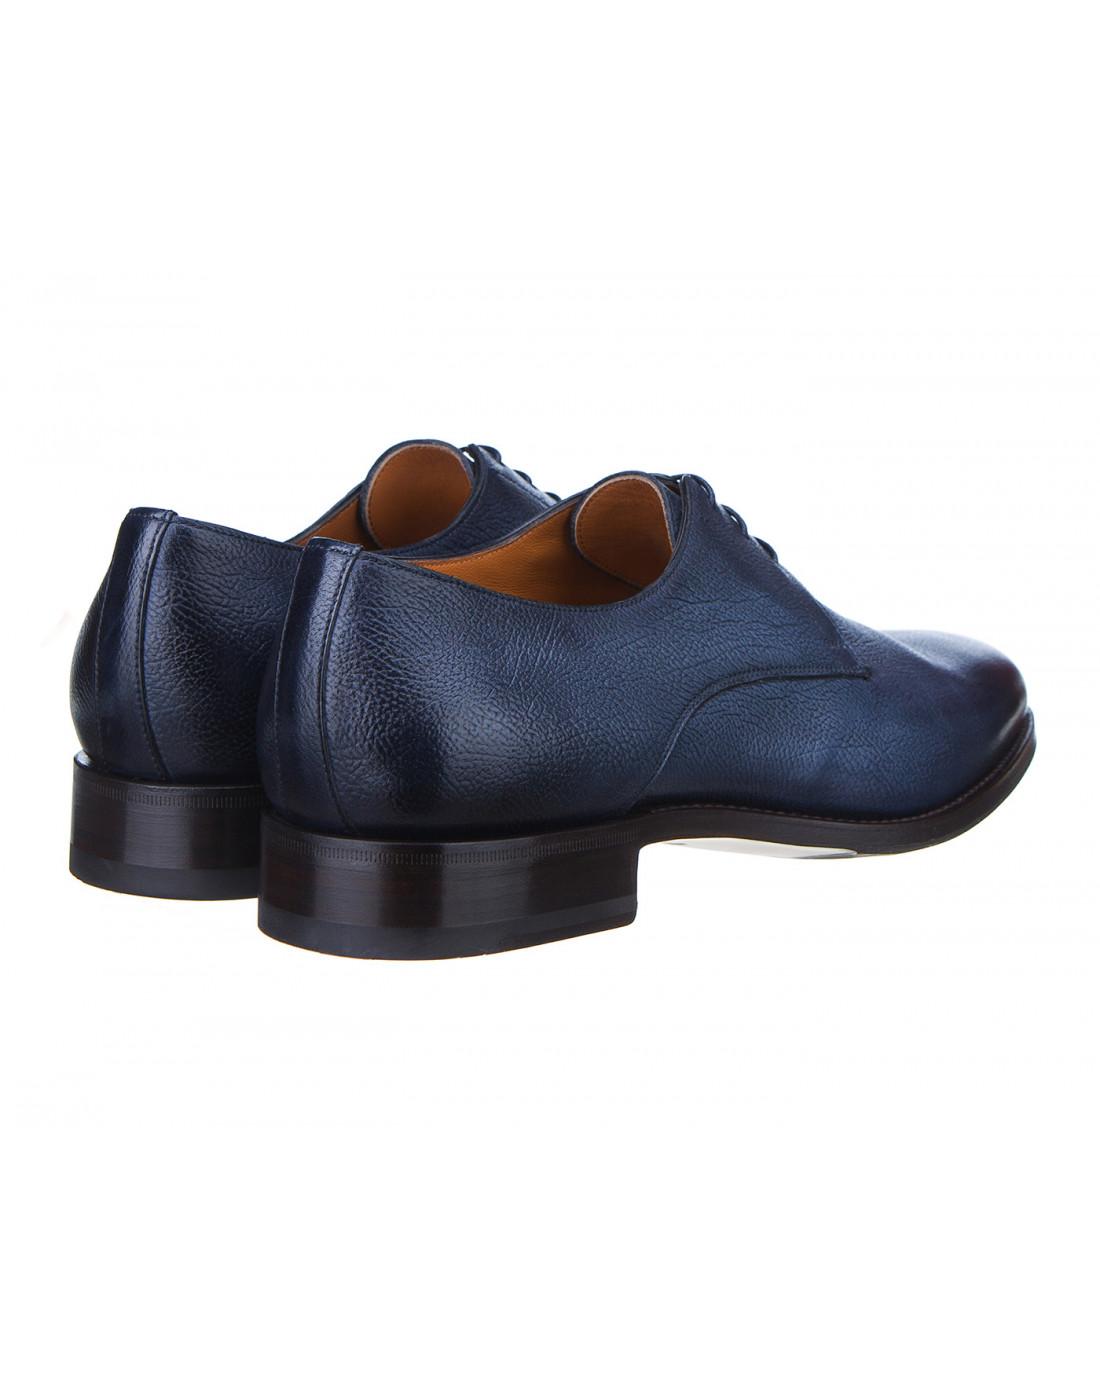 Туфли синие мужские Santoni S14303-3